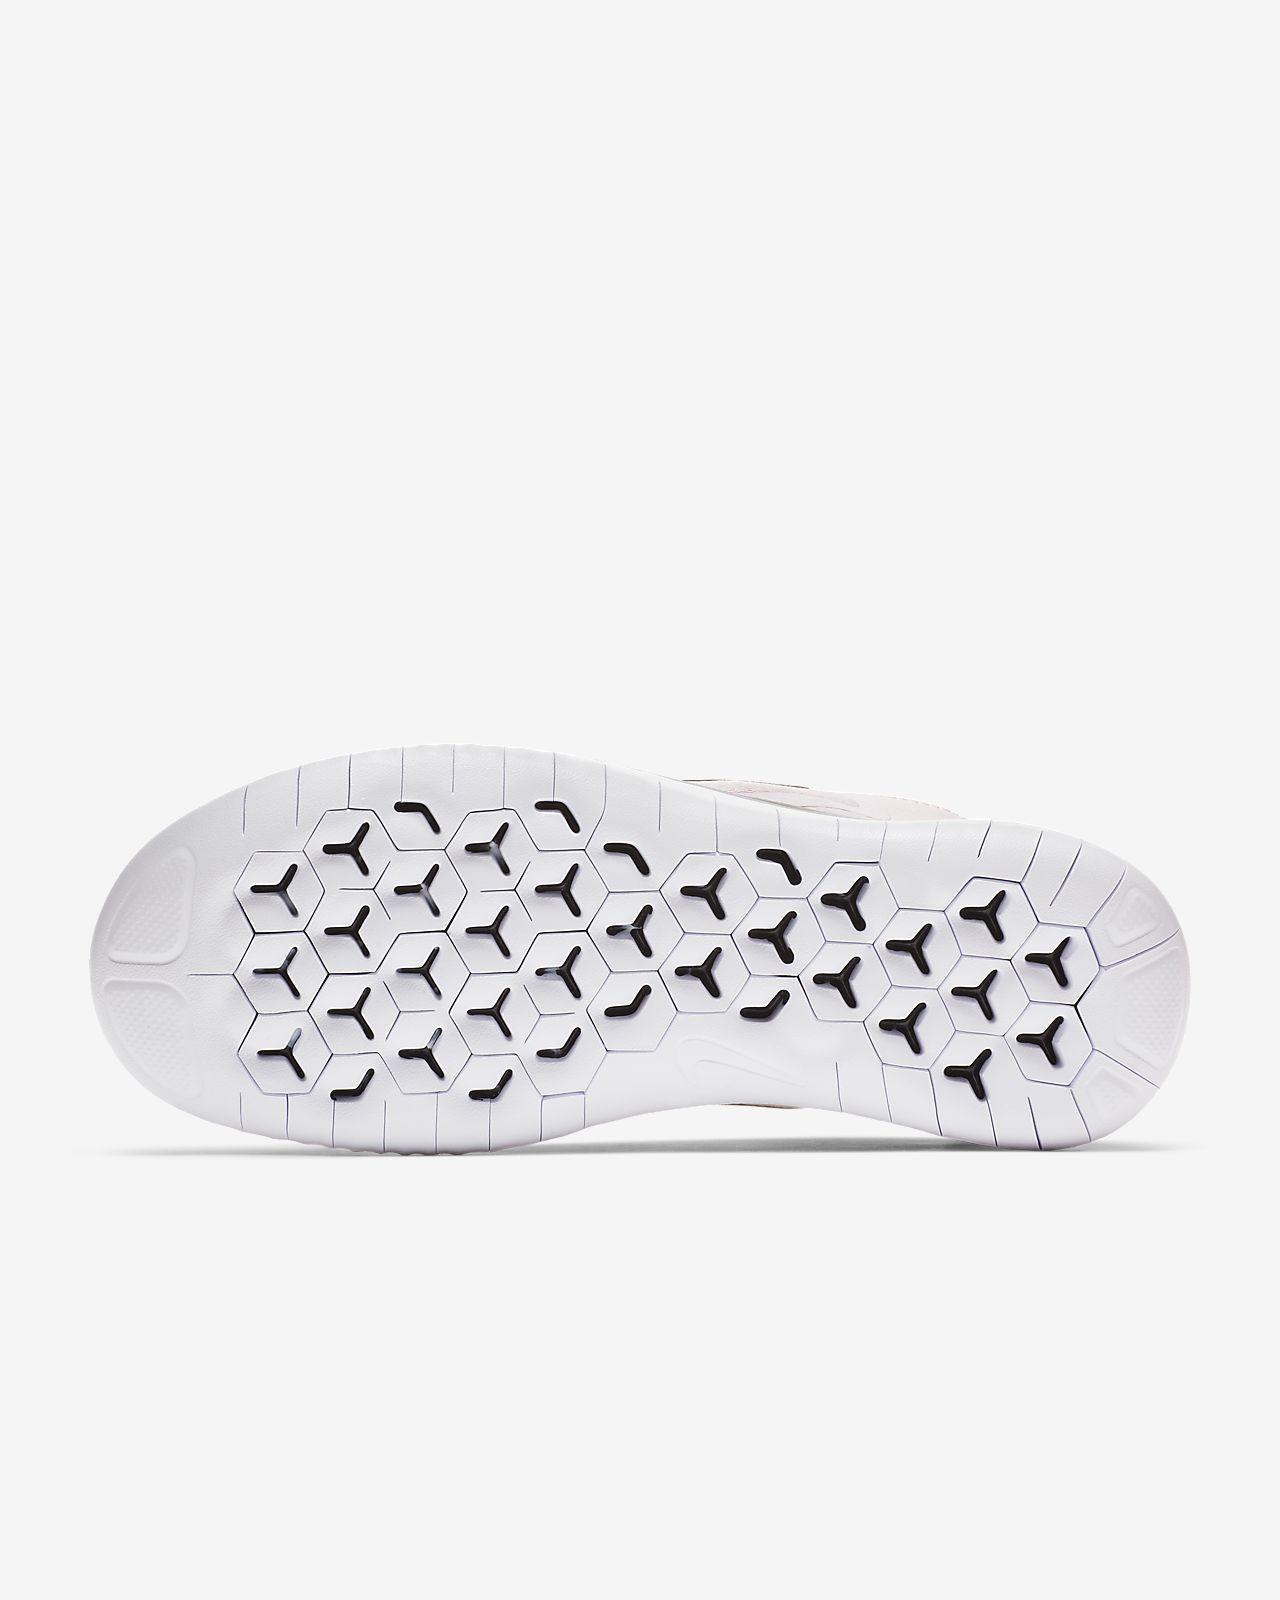 Free dames Nike Hardloopschoen RN 2018 voor Tnnz78w1